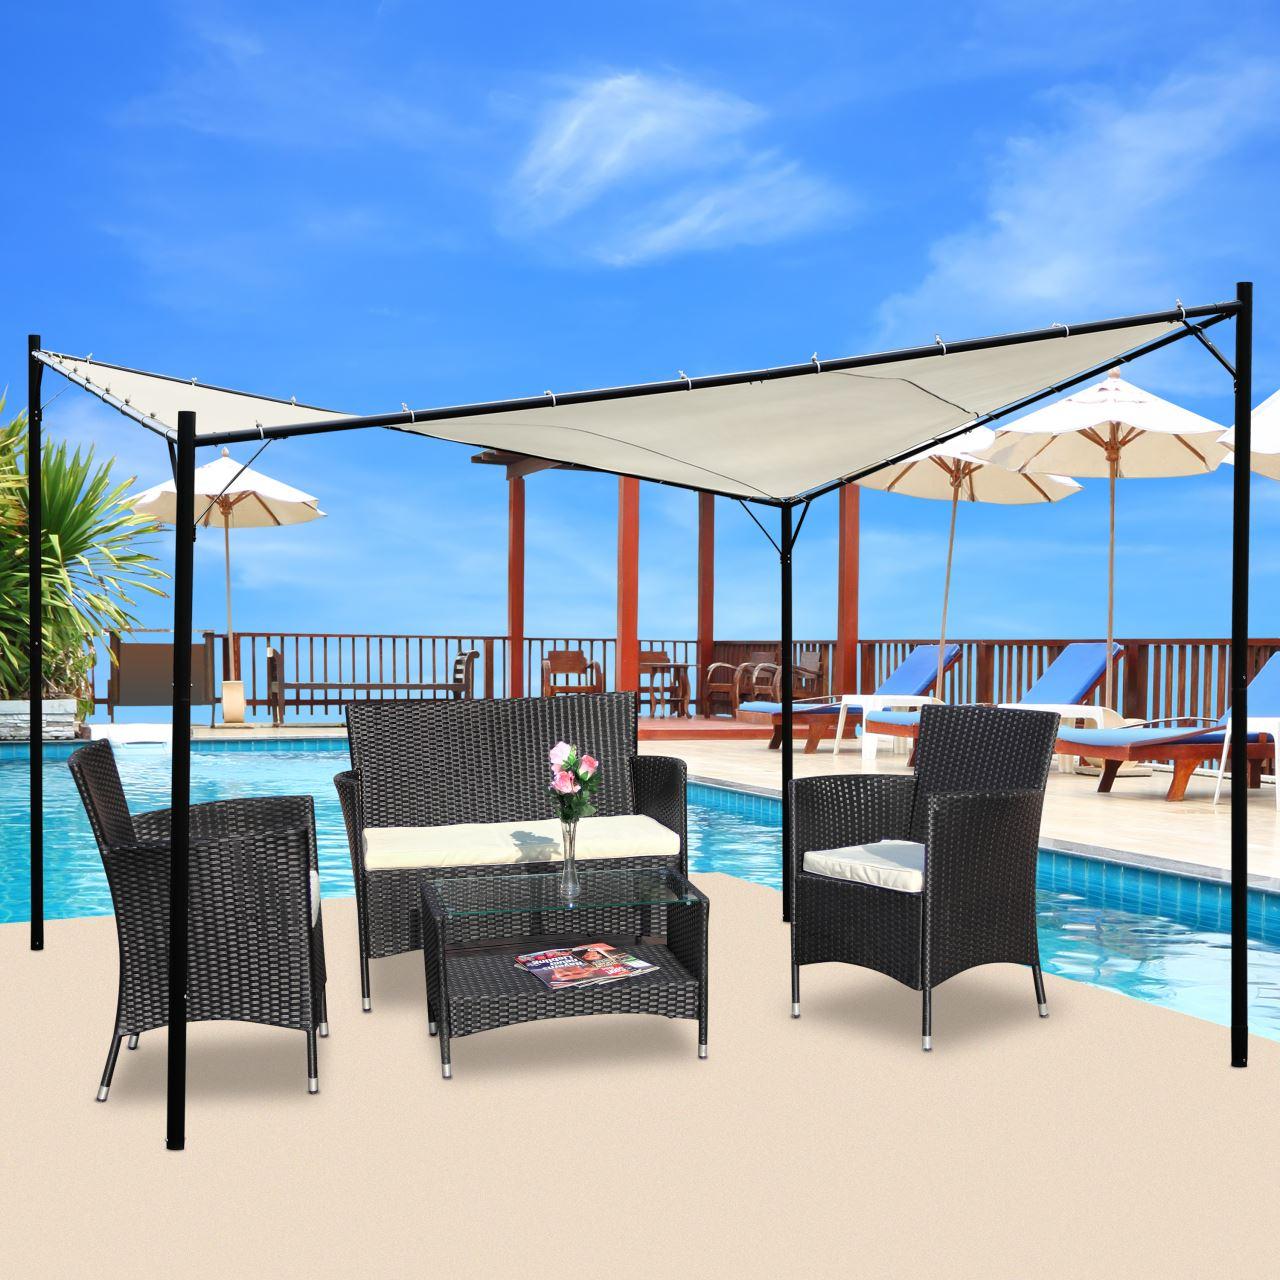 eleganter gartenpavillon schmetterling butterfly pavillon sonnensegel 4x4 meter 16m dach 100. Black Bedroom Furniture Sets. Home Design Ideas